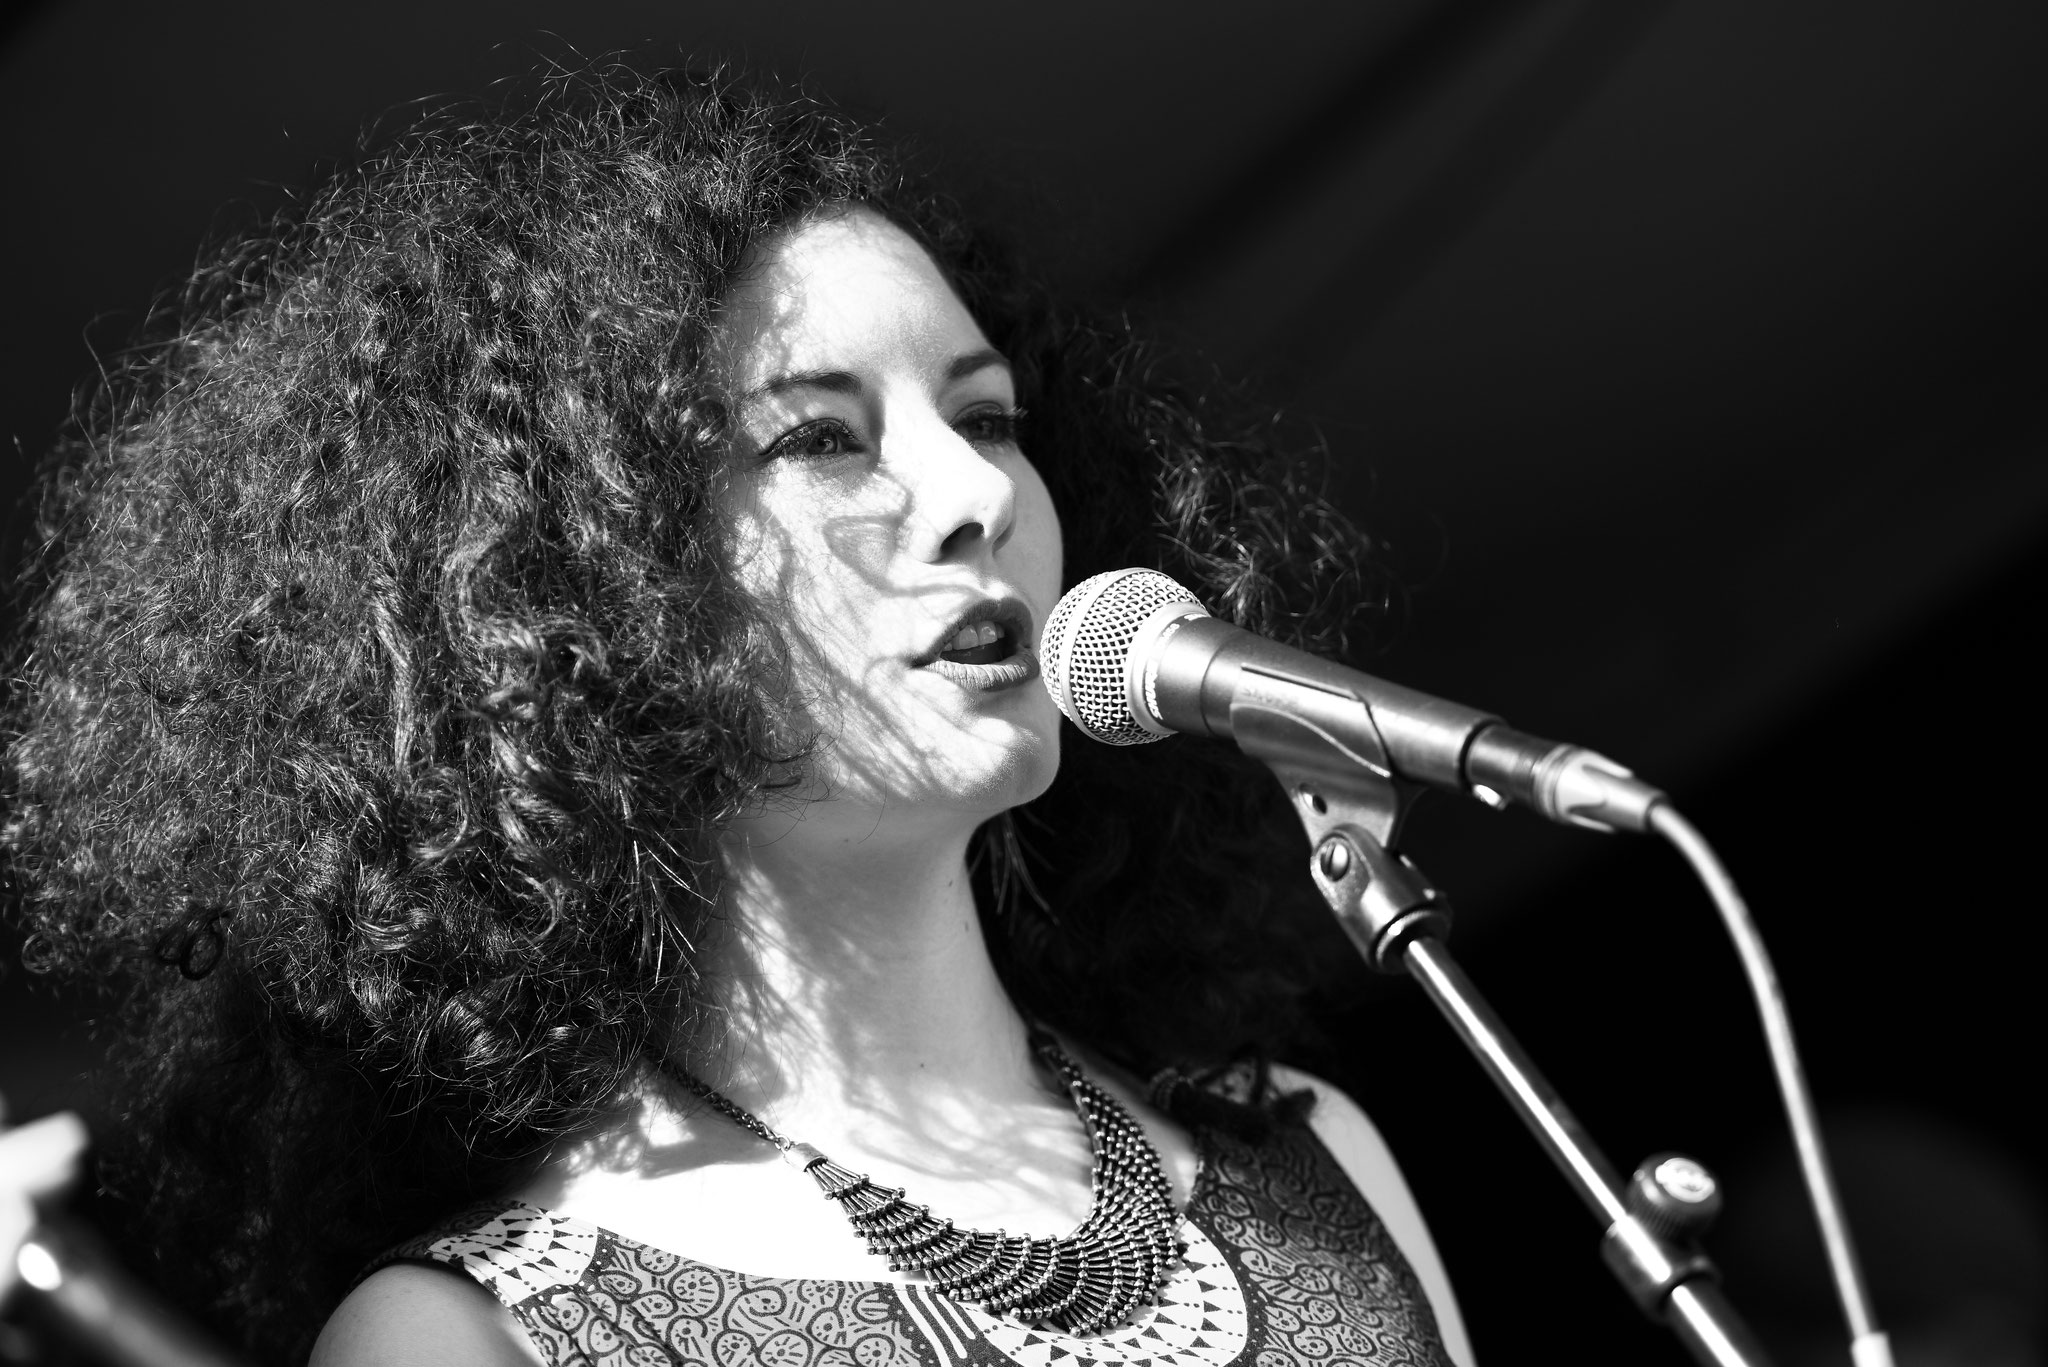 Afro-Pfingsten, 02.06.2017, Winterthur (Foto: Marc Hächler)